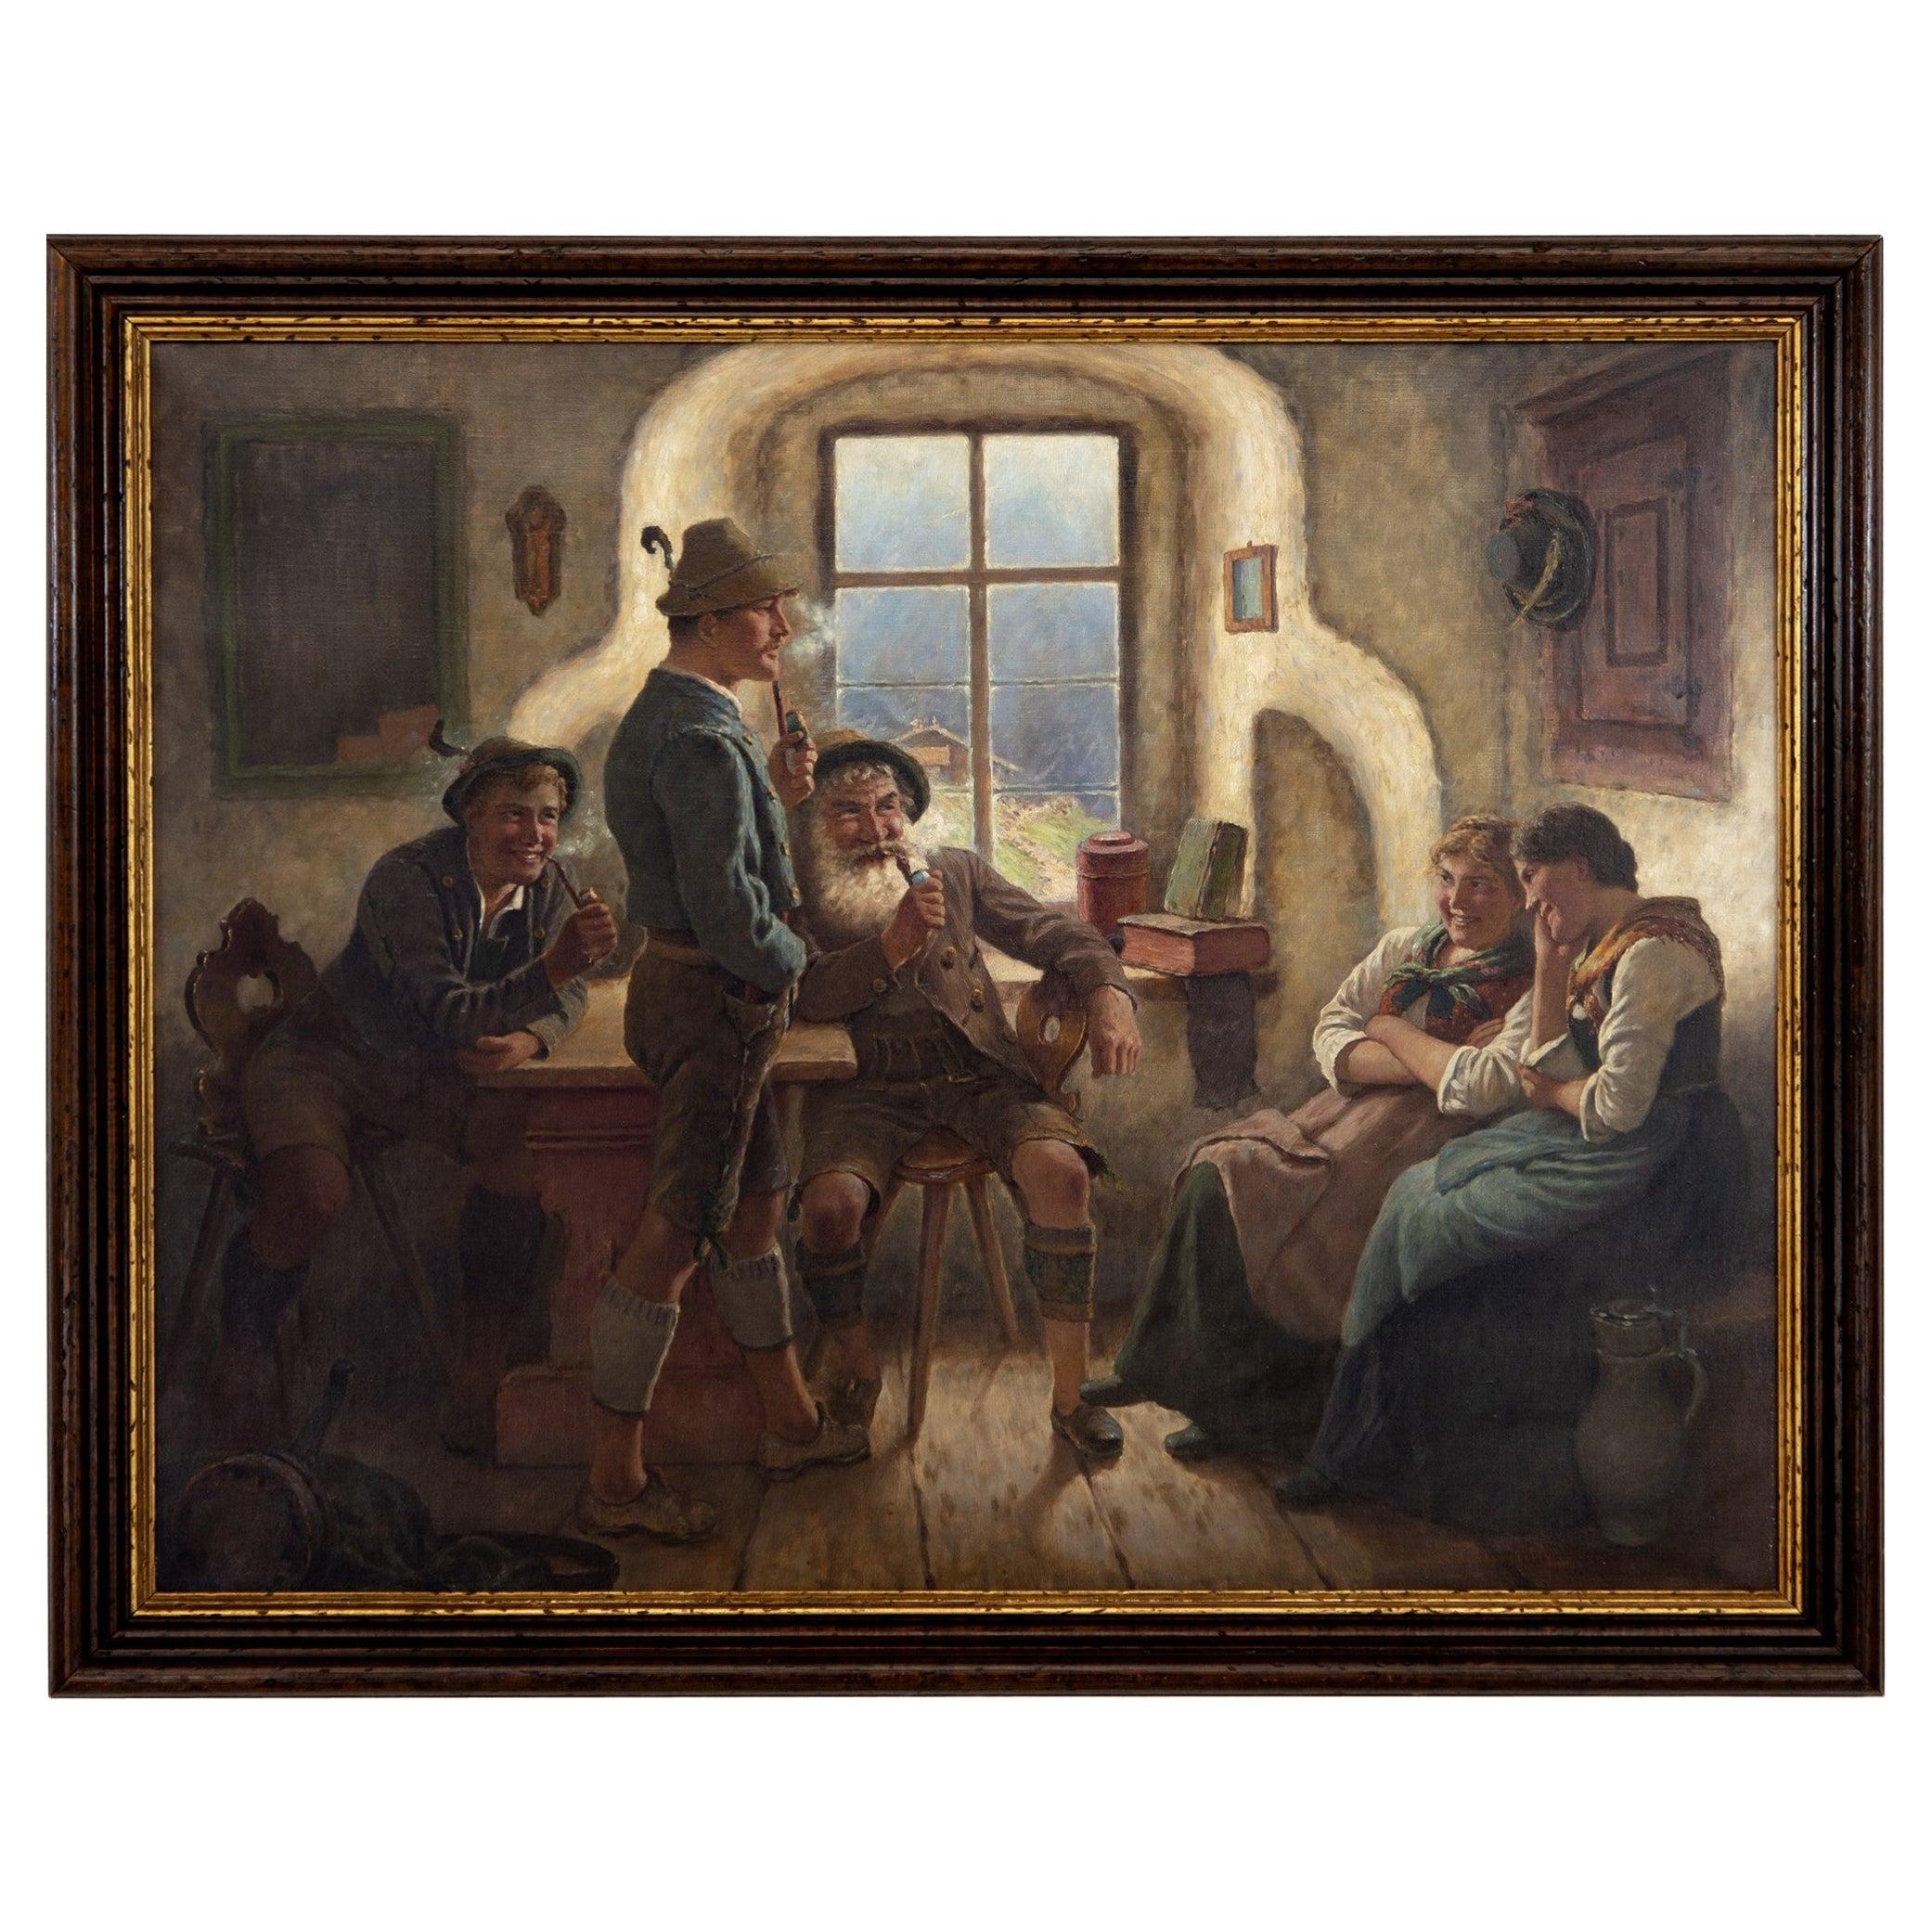 M. Wachsmuth 1890s Oil Painting German Bavarian Tavern Scene Lederhosen & Dirndl